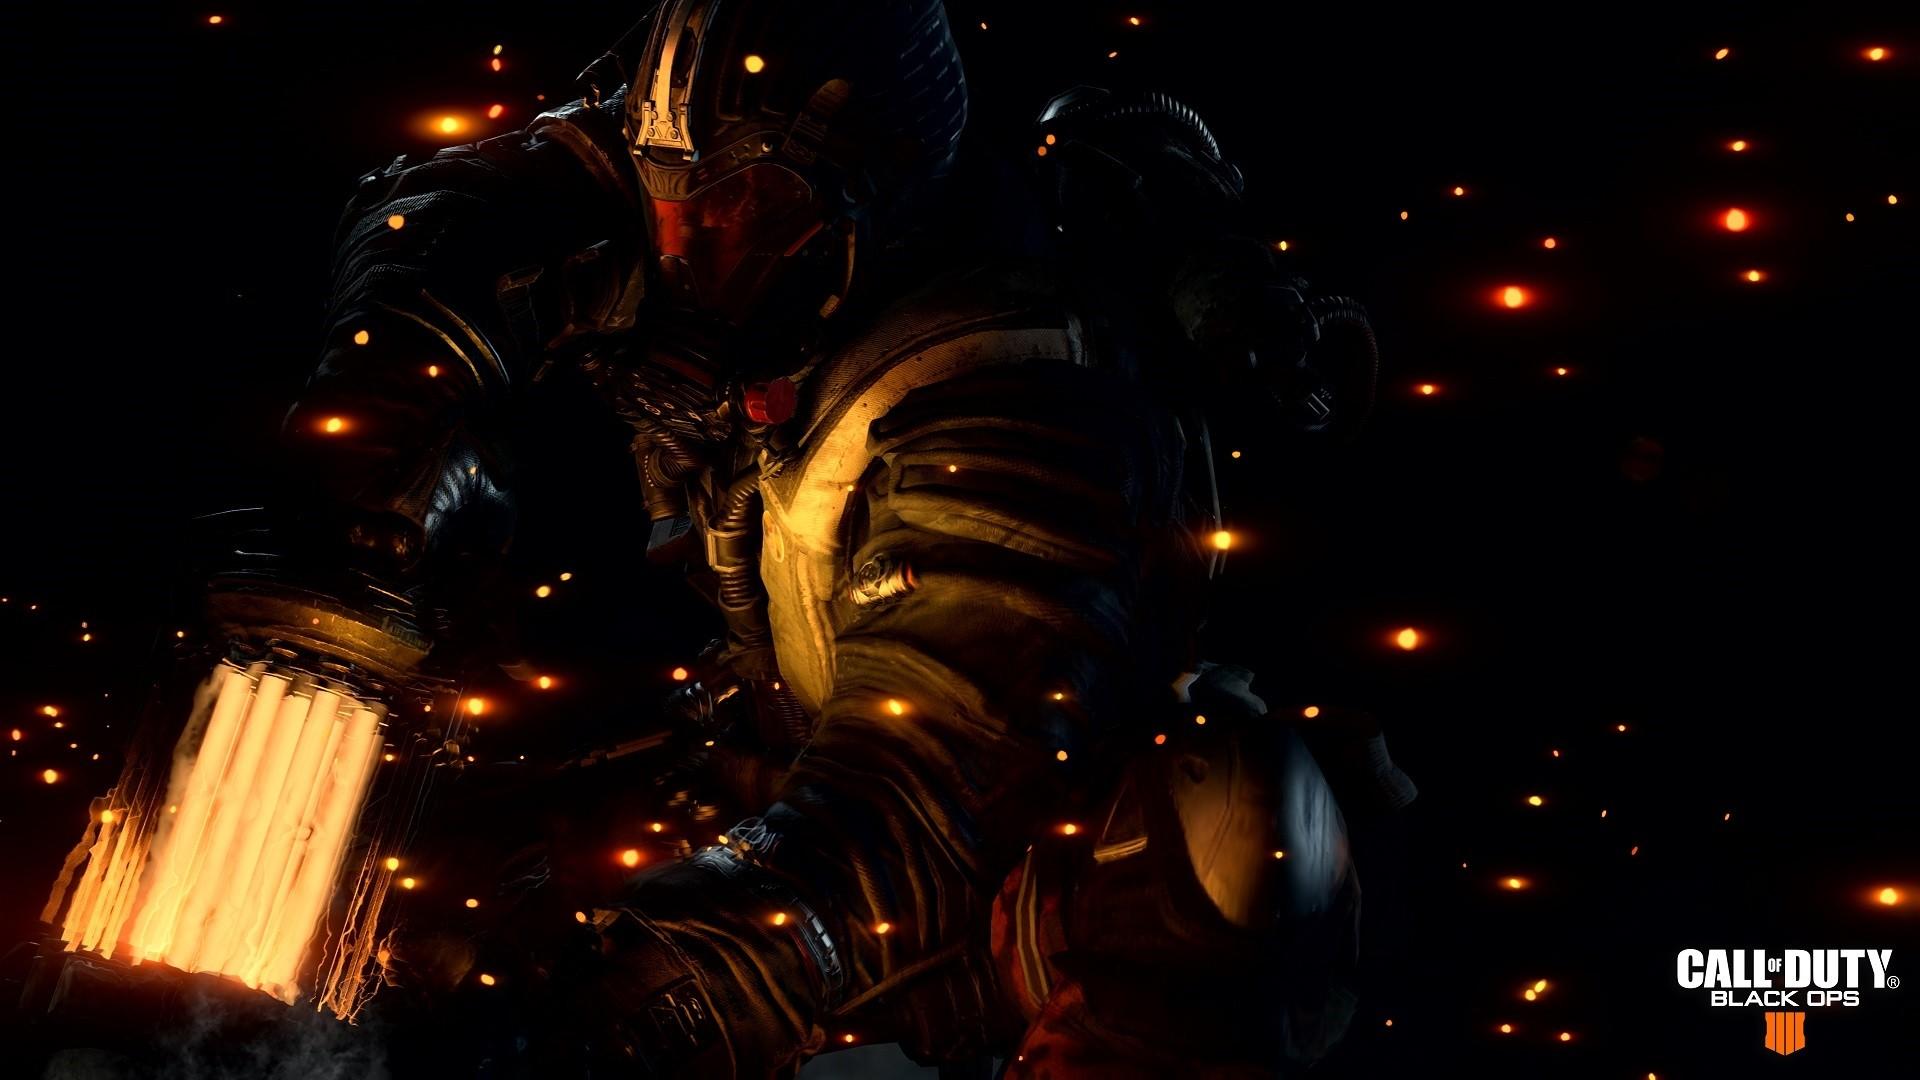 Blackout download wallpaper image